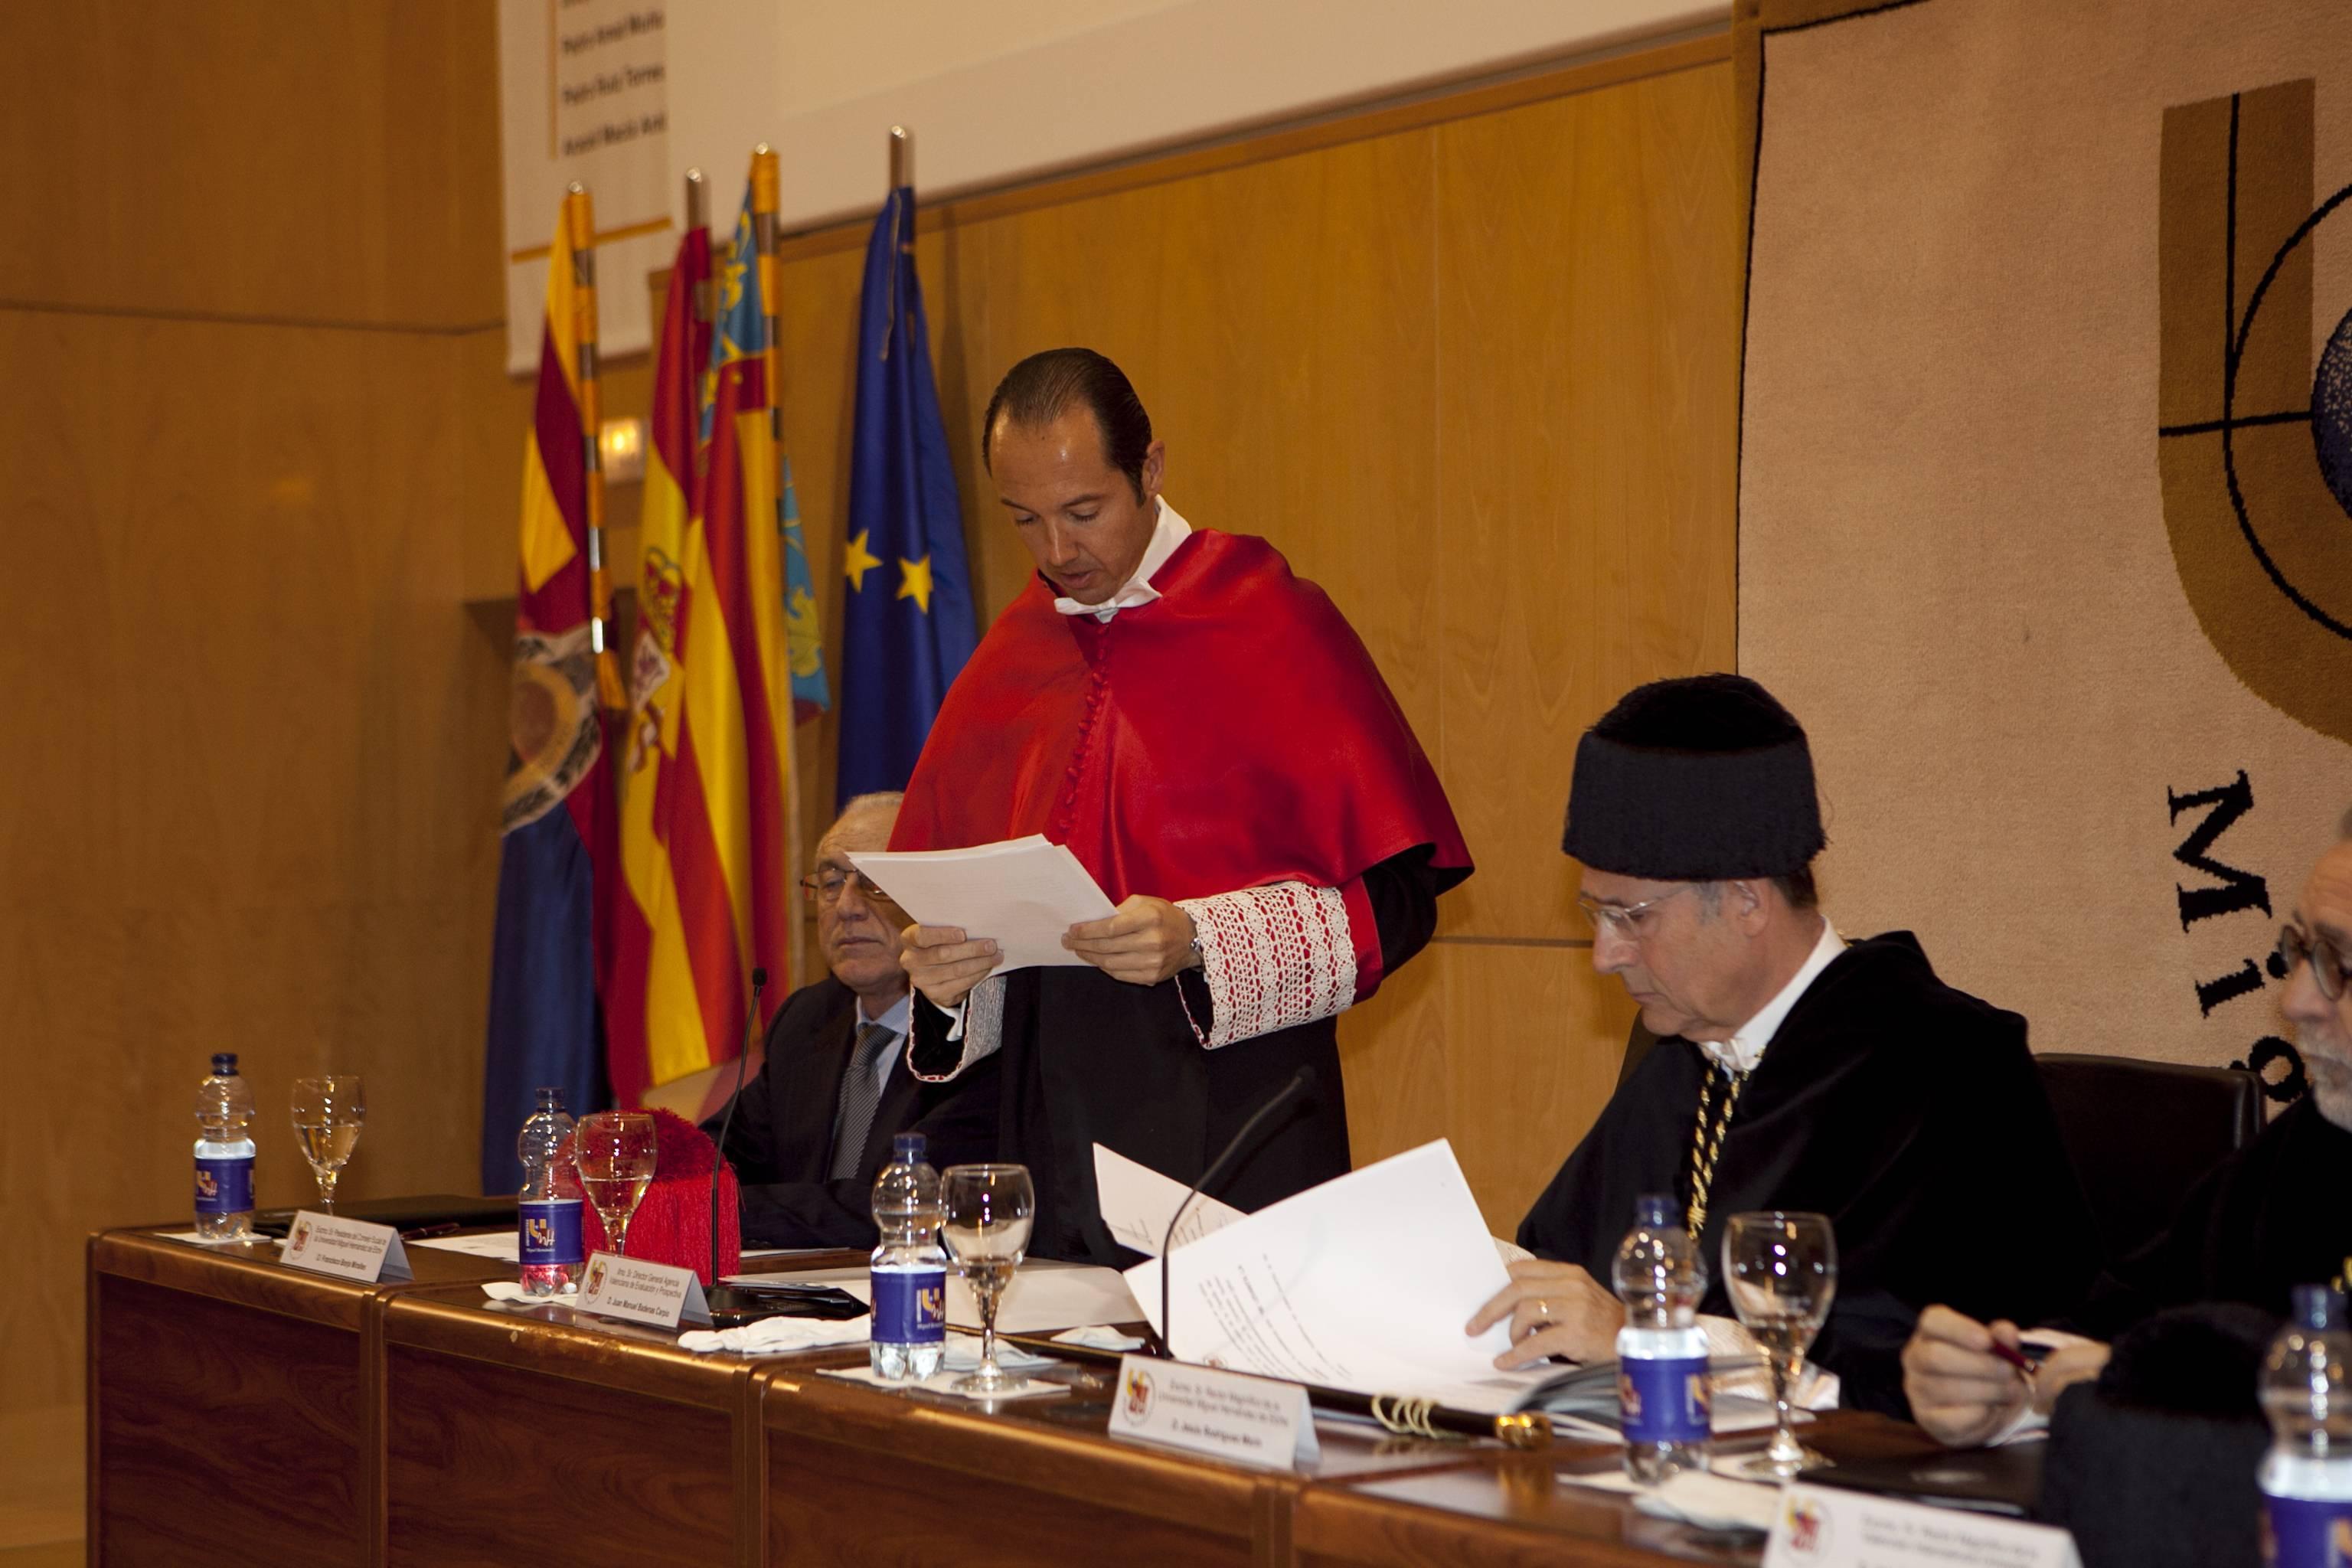 doctor-honoris-causa-luis-gamir_mg_1215.jpg